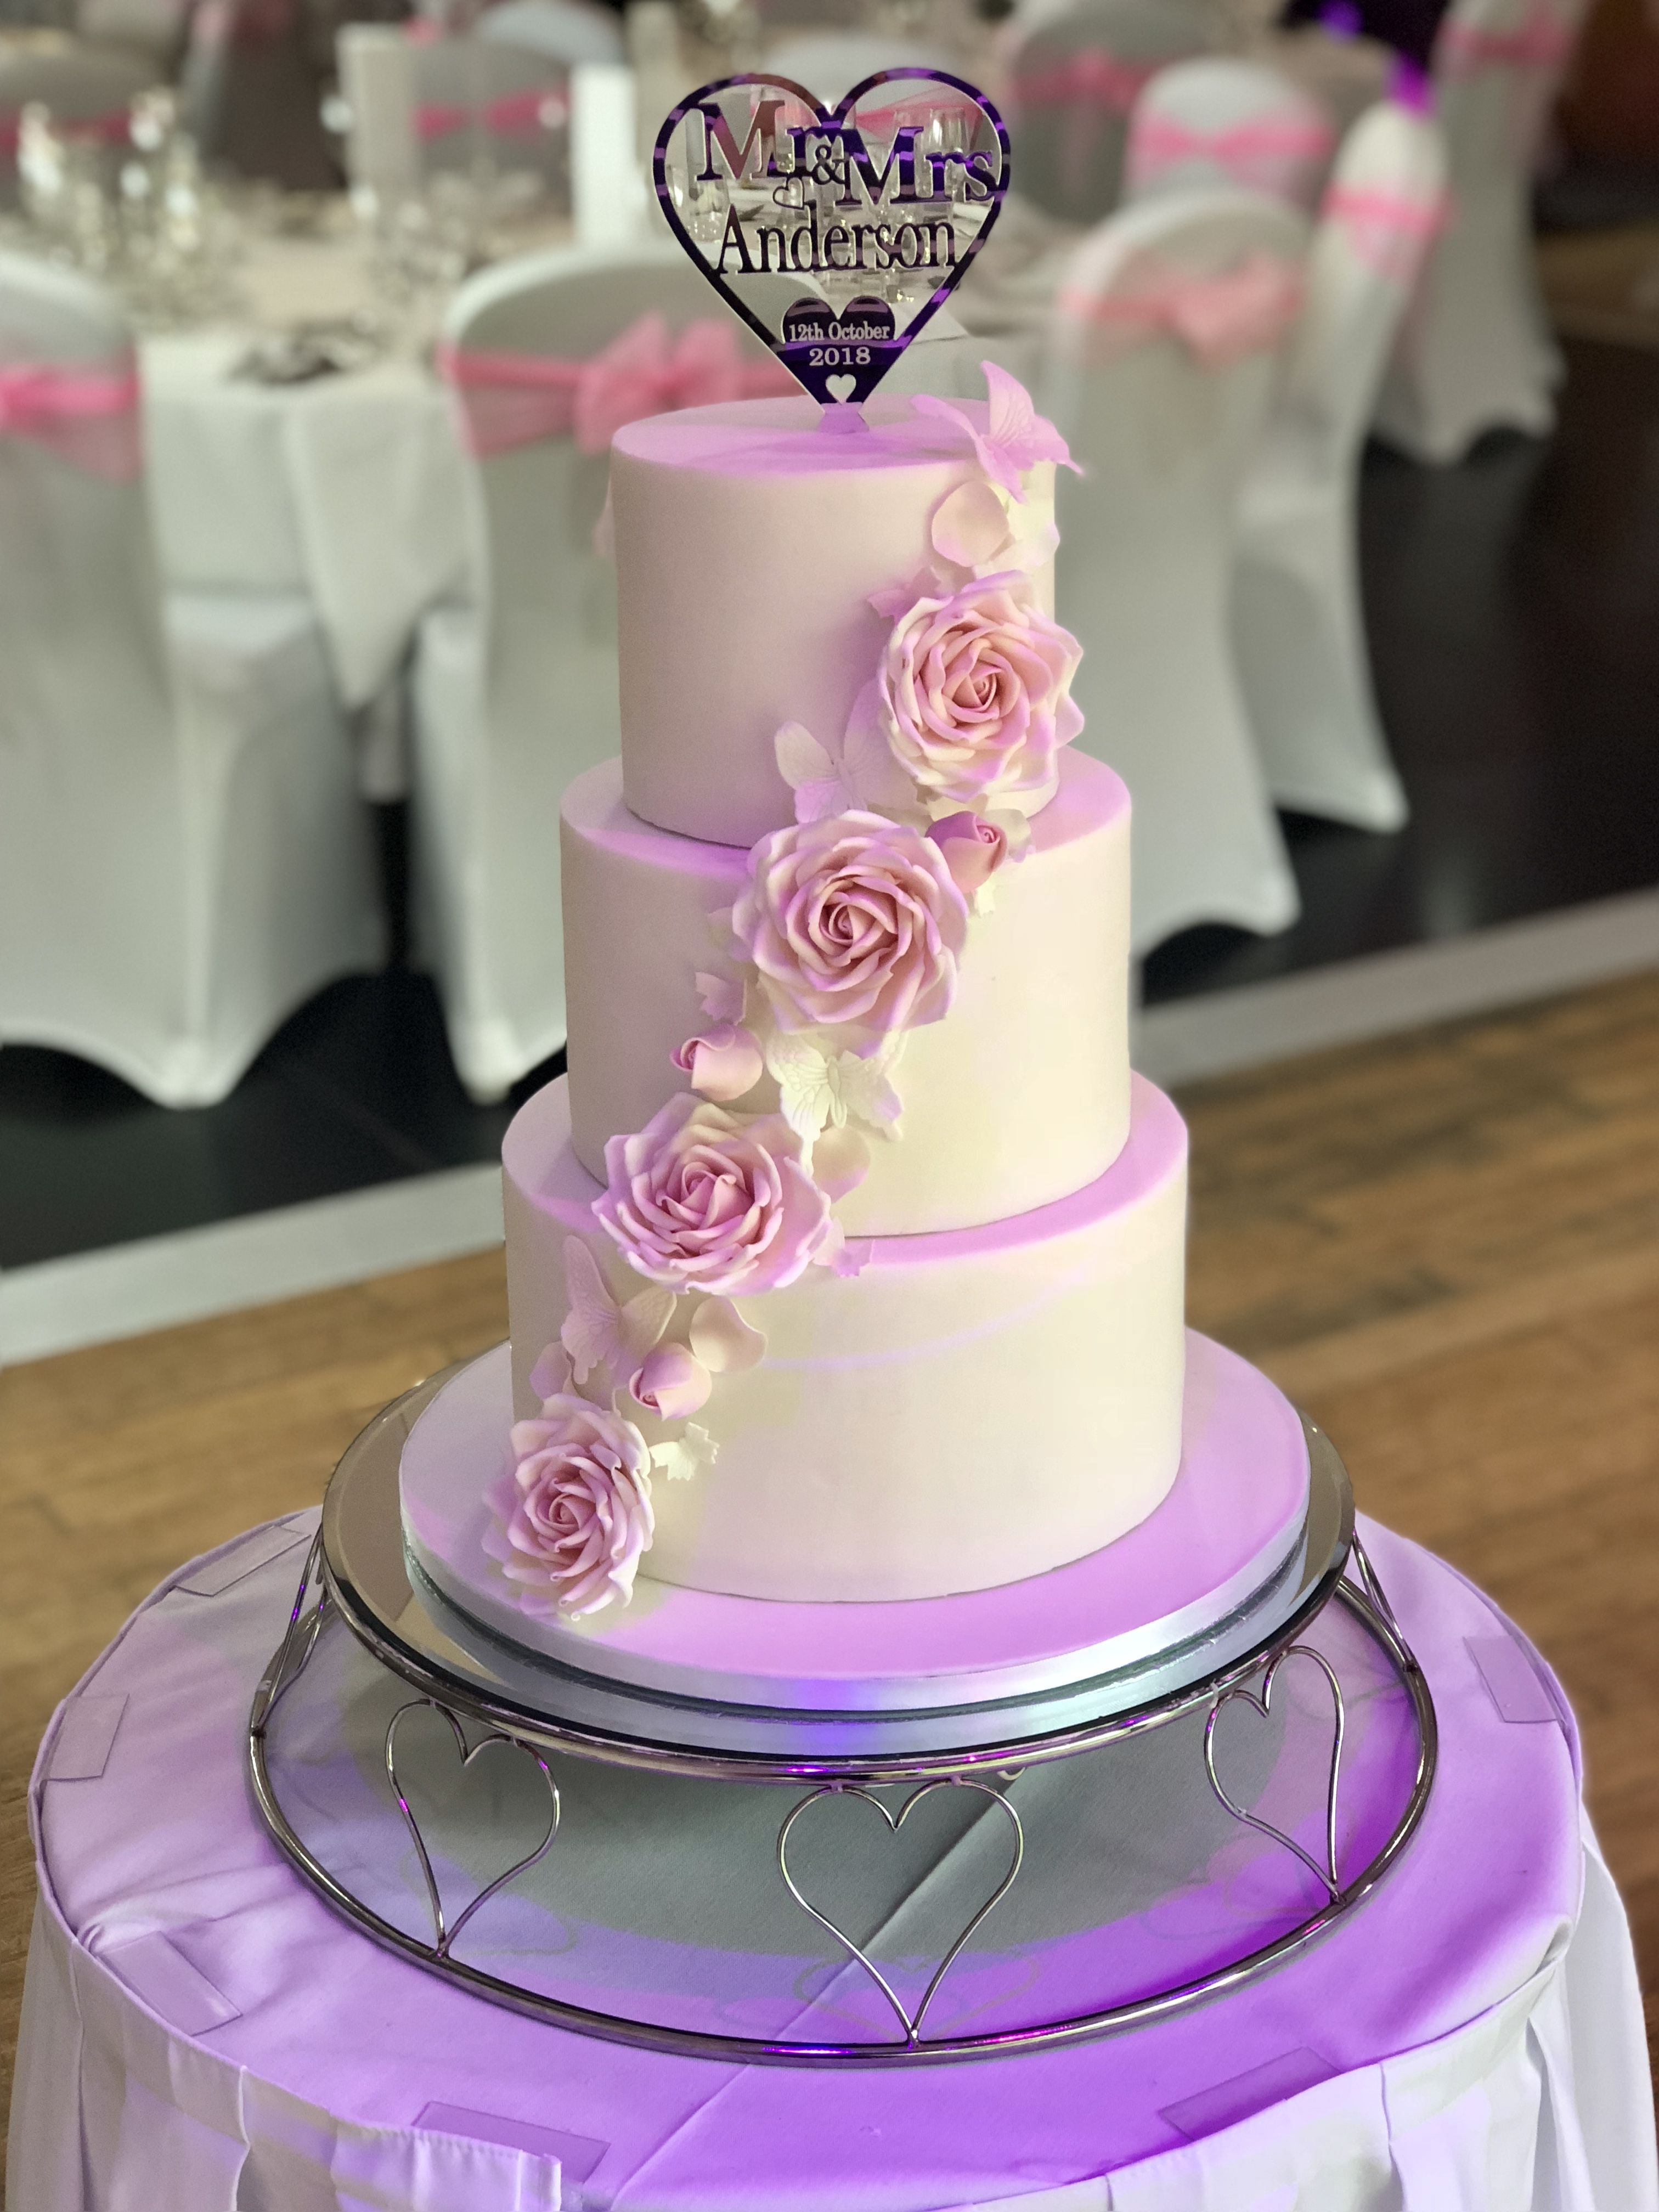 Wedding decorations purple october 2018 Pin by Caledonian Designer Cakes on Wedding cakes  Pinterest